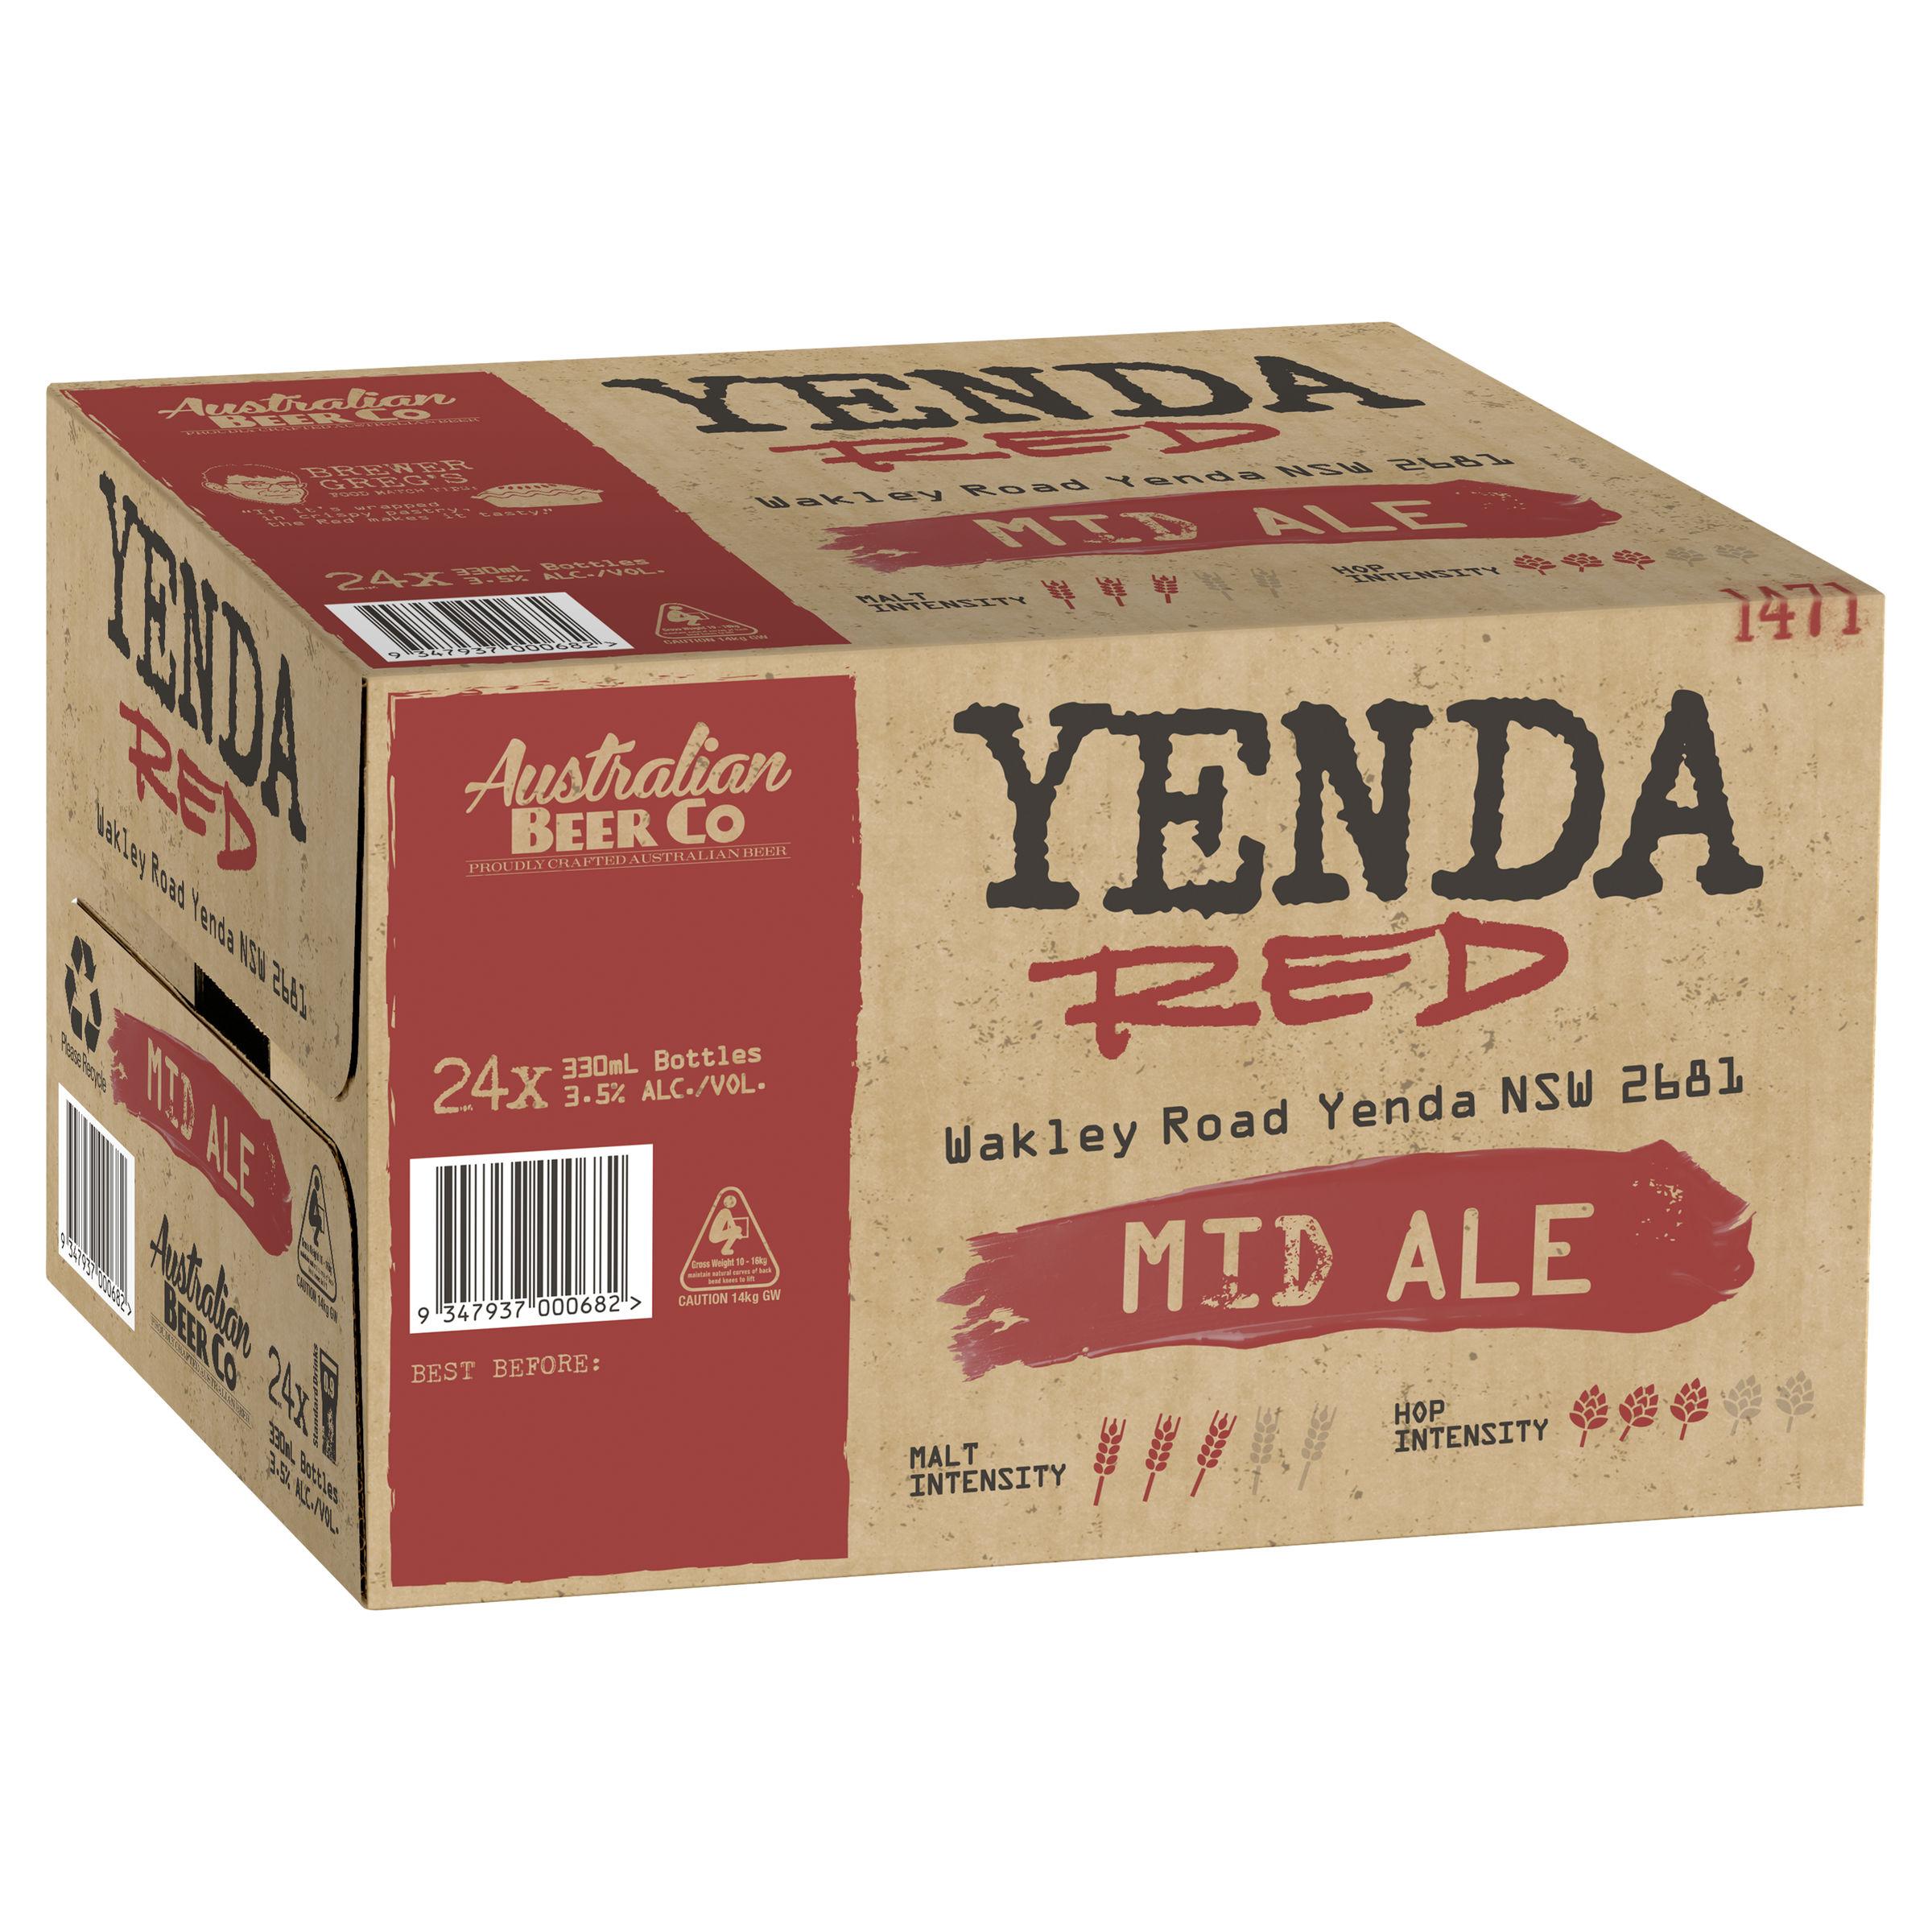 AUSTRALIAN BEER COMPANY YENDA RED MID